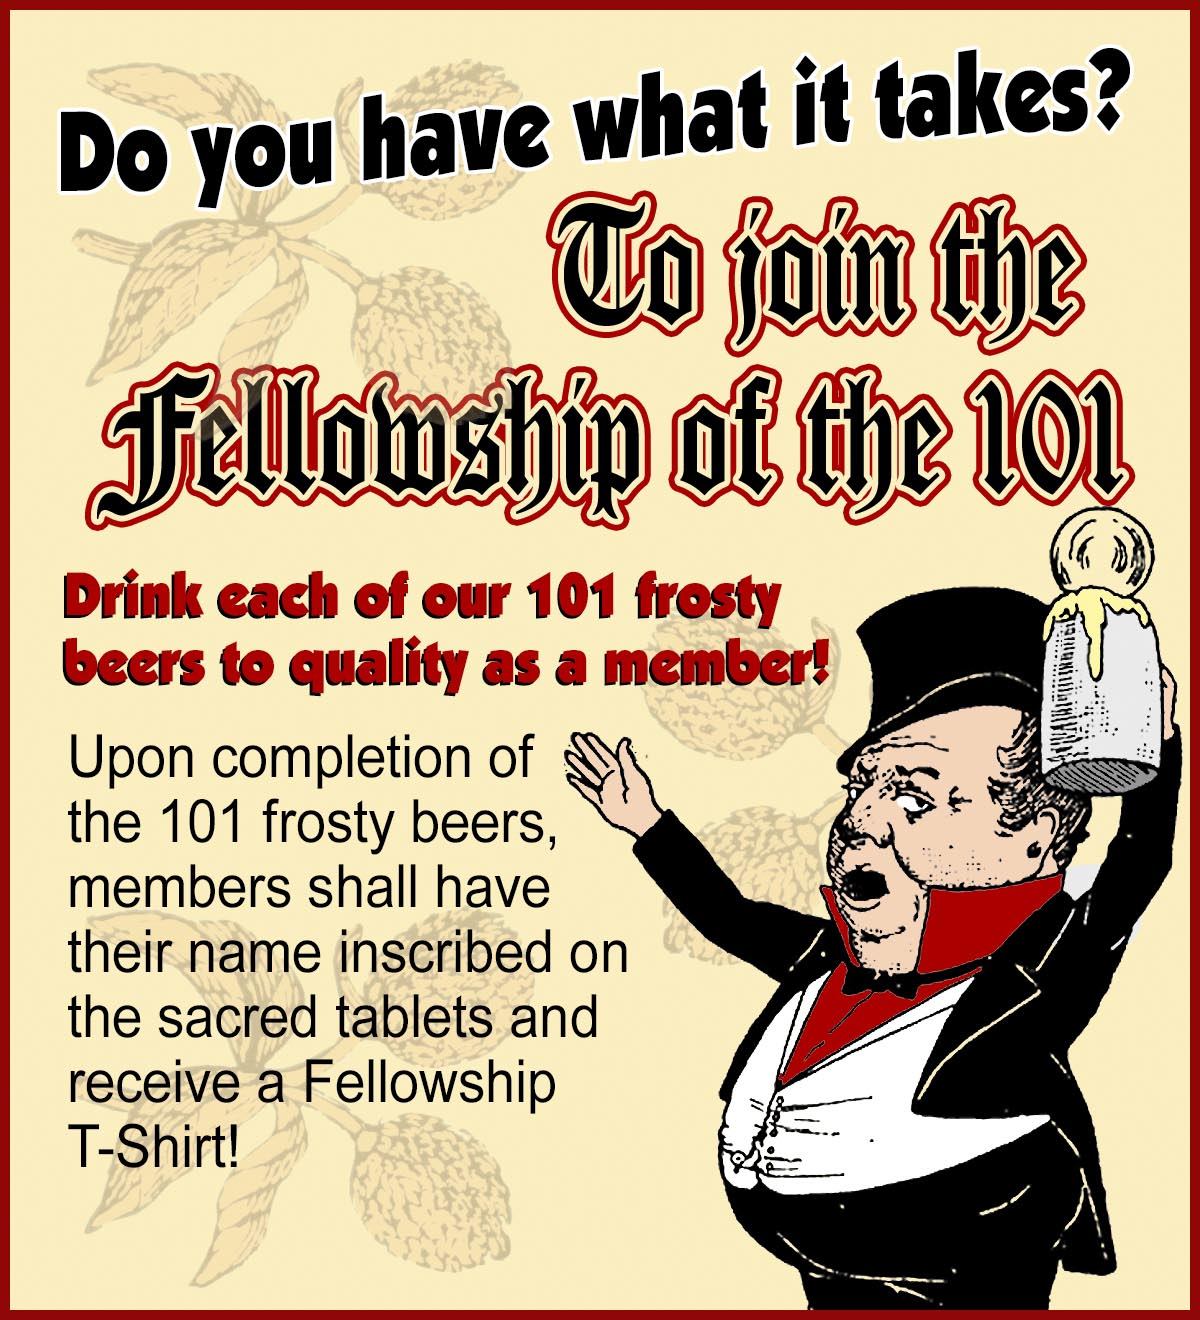 Fellowship Of The 101 For Wesbite